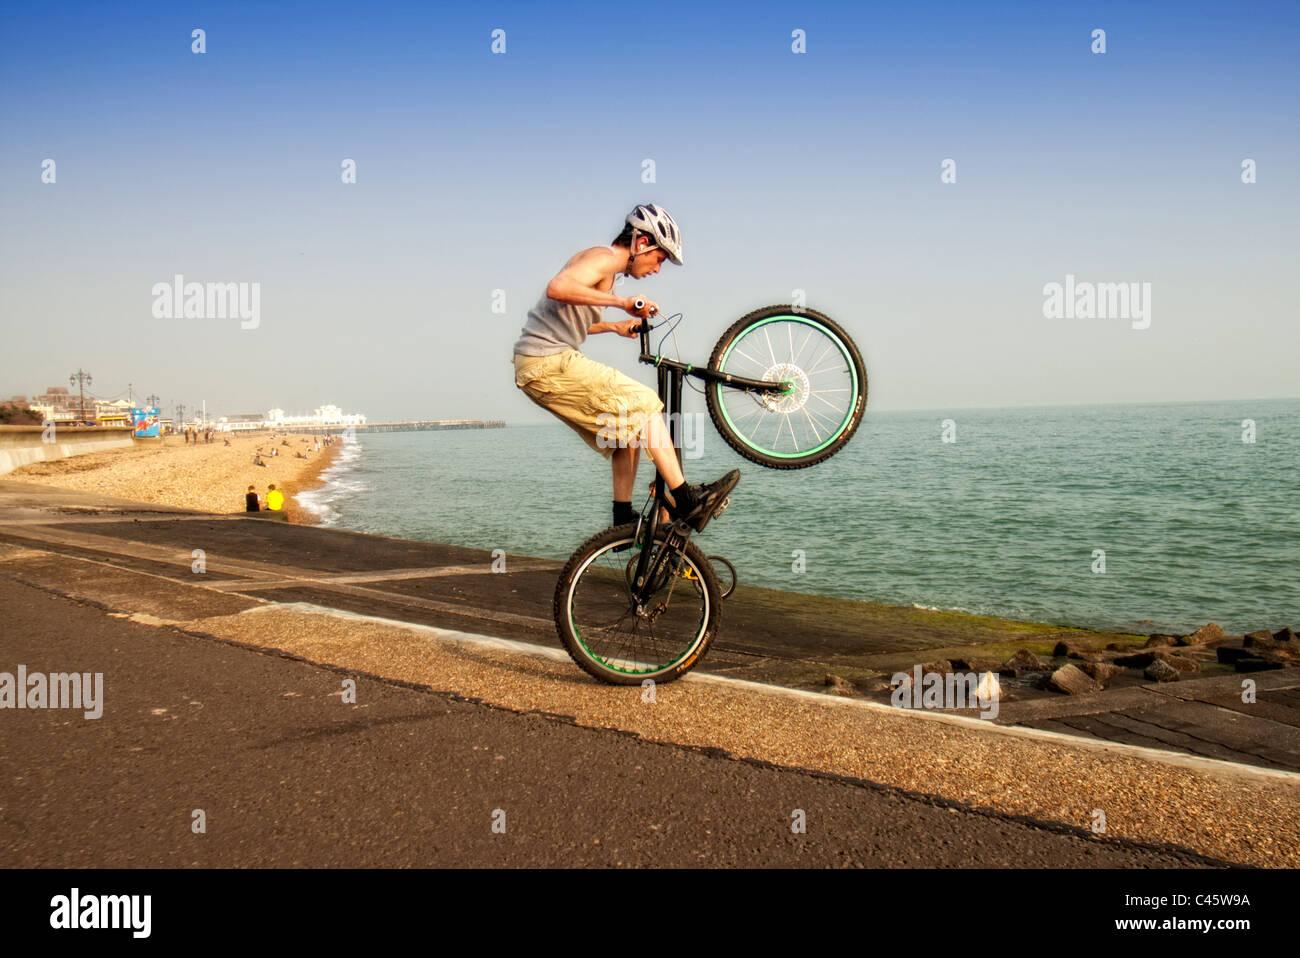 young man doing wheelie tricks stunts on his BMX bike - Stock Image